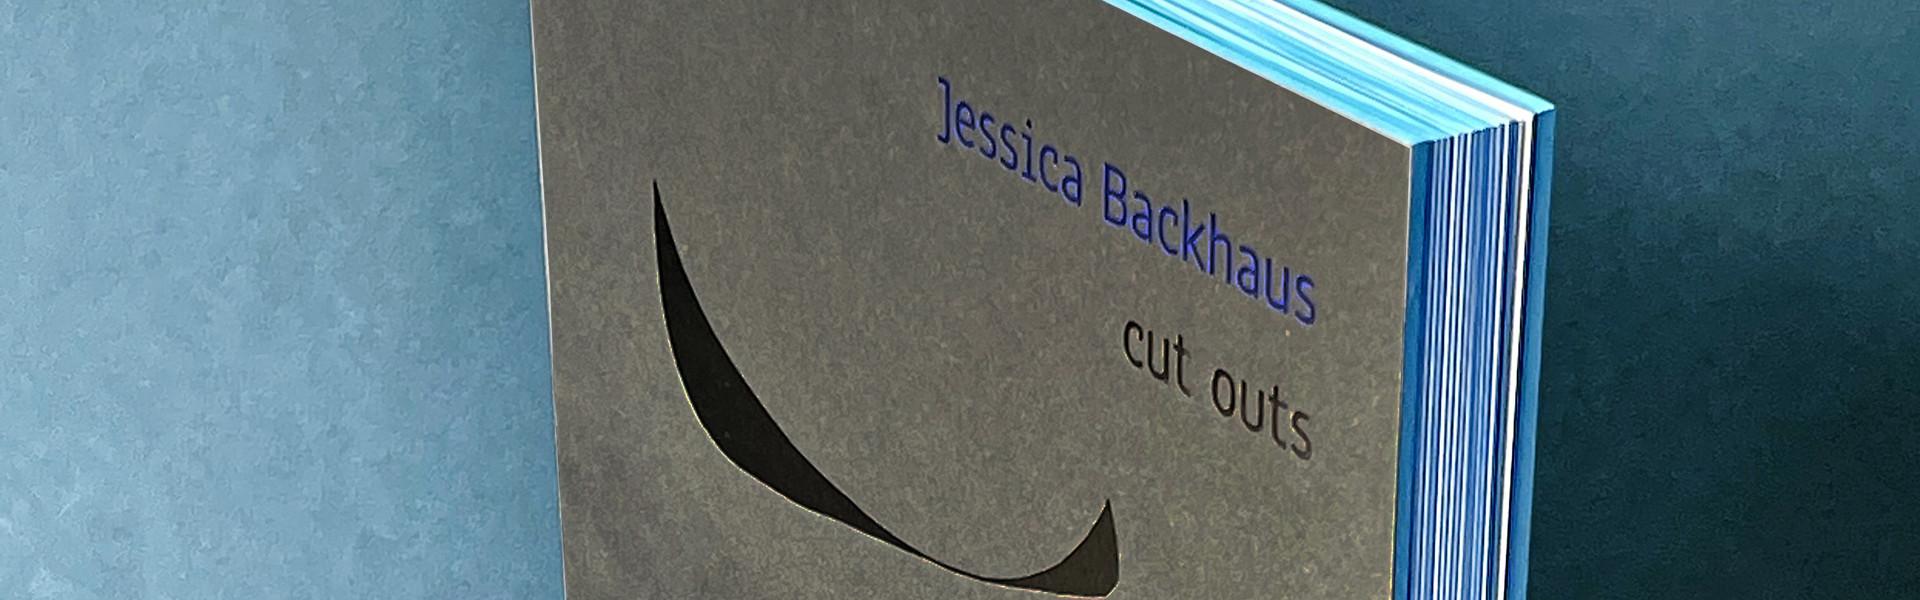 Jessica Backhaus Cut Outs